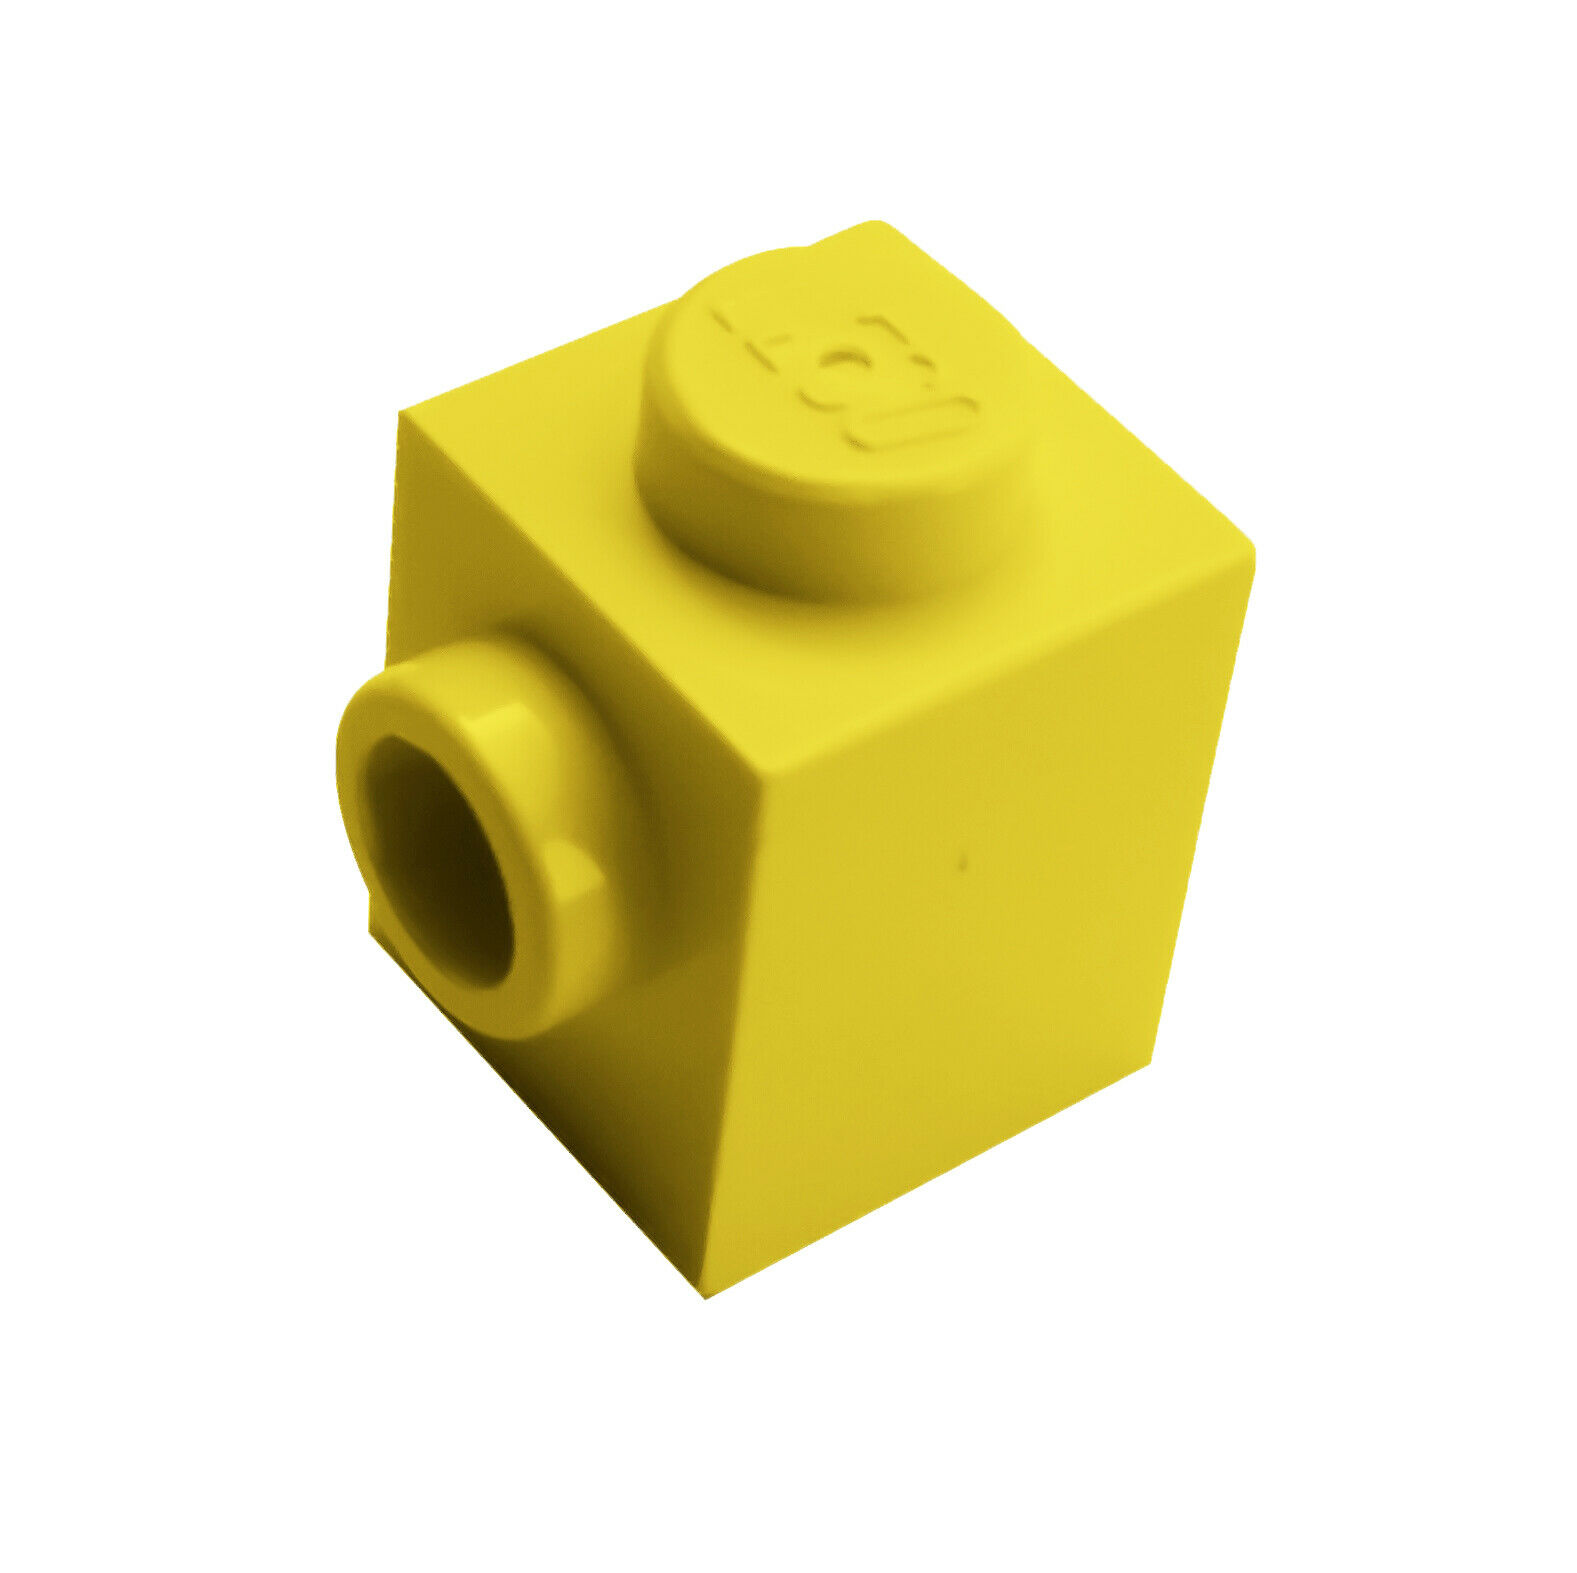 LEGO 87087 1X1 STUD ON 1 SIDE BRICK MEDIUM STONE GREY PACK OF 20